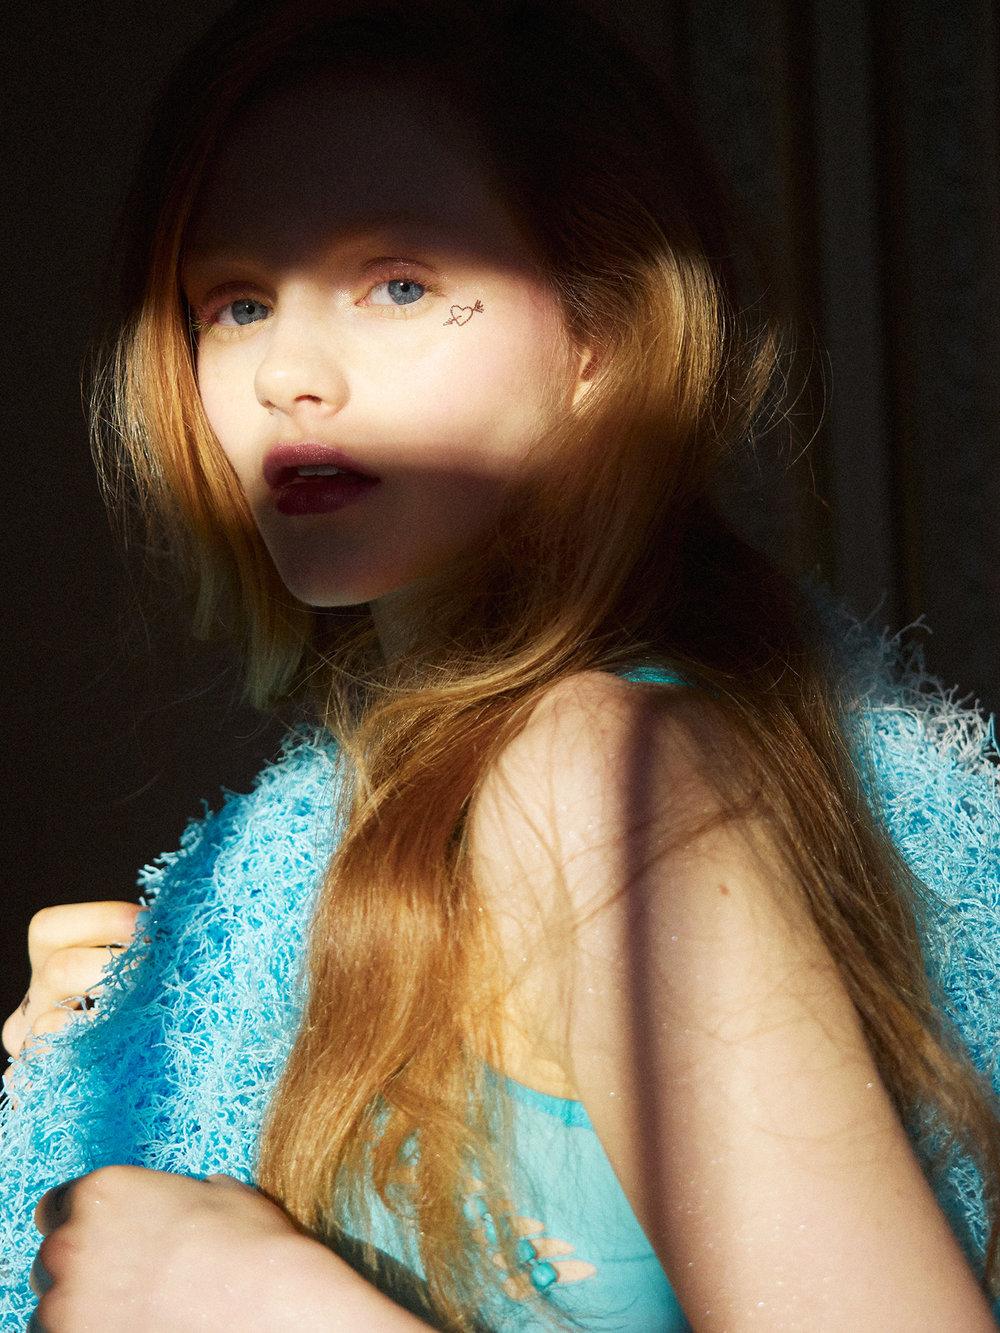 056-icon-artist-management-Kristin-Vicari-Beauty-Please01.jpg